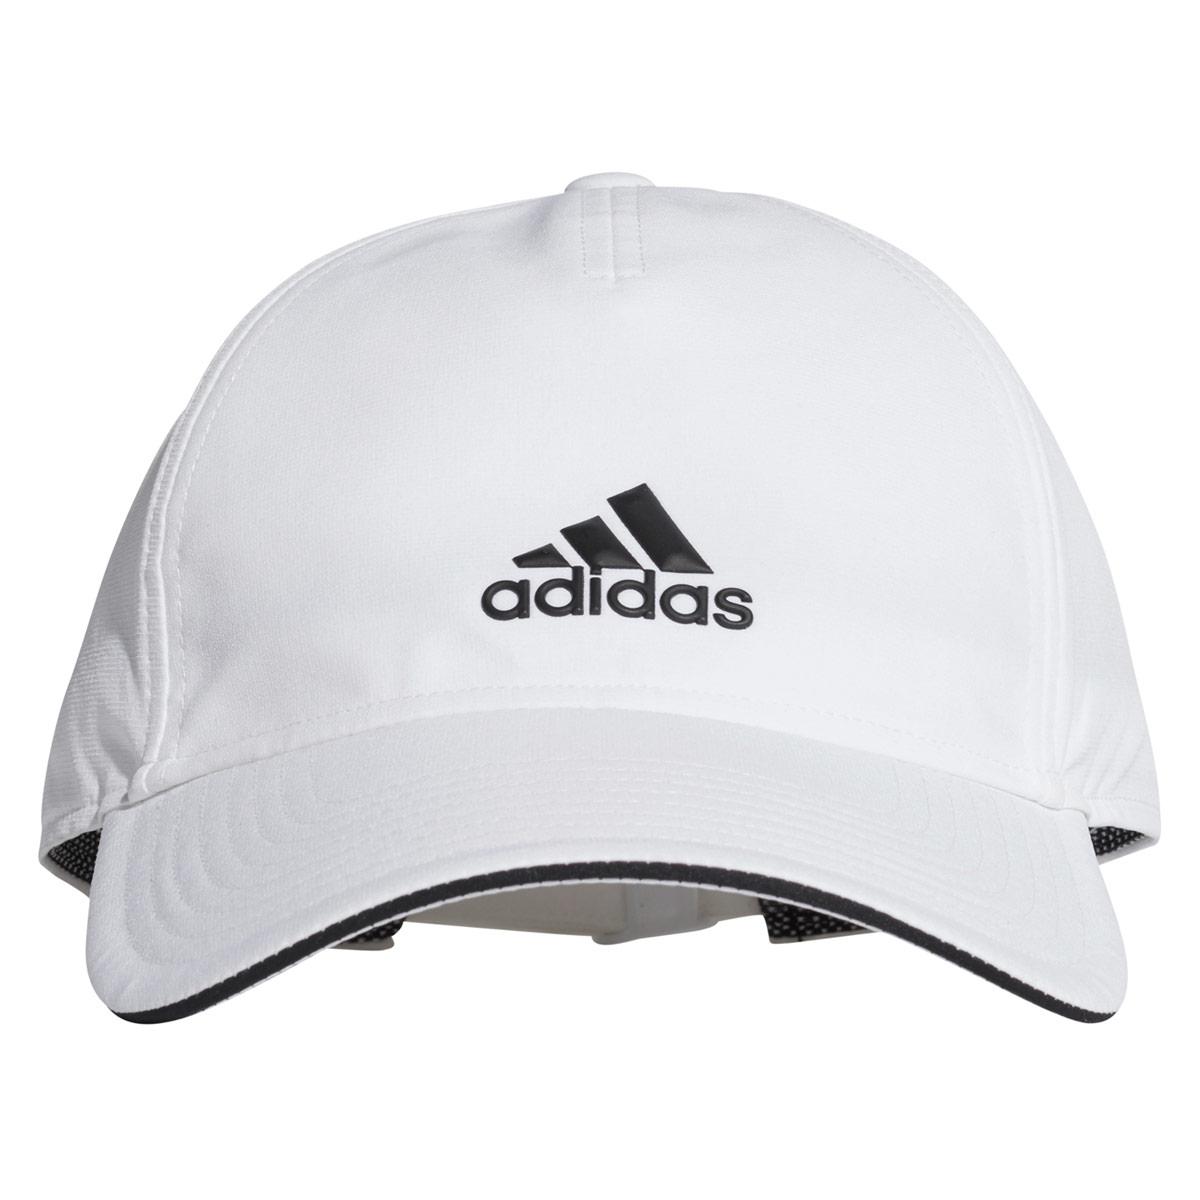 CasquettesChapeauxBlanc Kappe Adidas Adidas C40 Climalite 2E9YDWHI